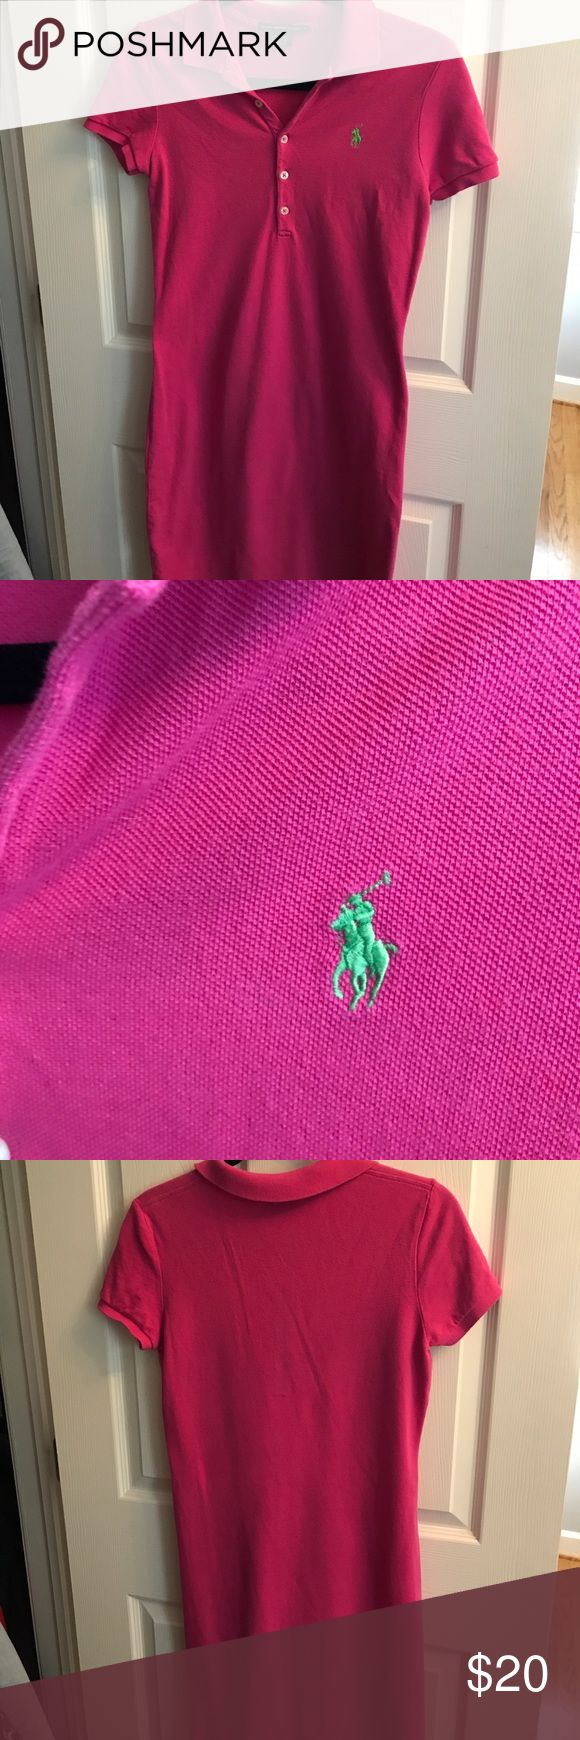 Polo shirt dress size Small Hot pink polo shirt dress size Small. Hardly worn! Polo by Ralph Lauren Dresses